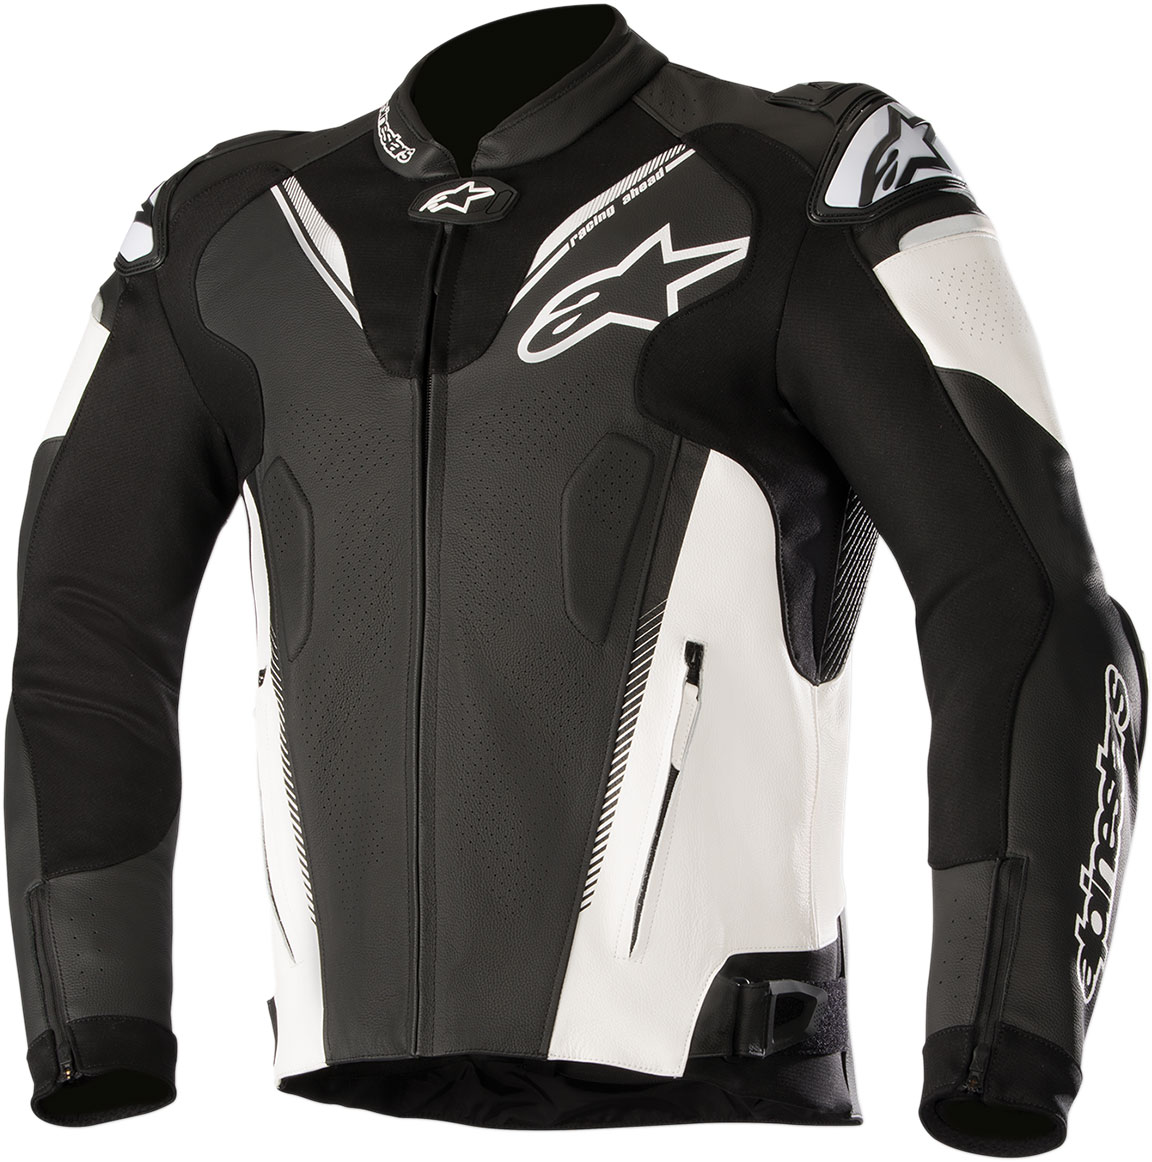 Alpinestars ATEM v3 Leather Jacket w/Aero Hump (Black/White)